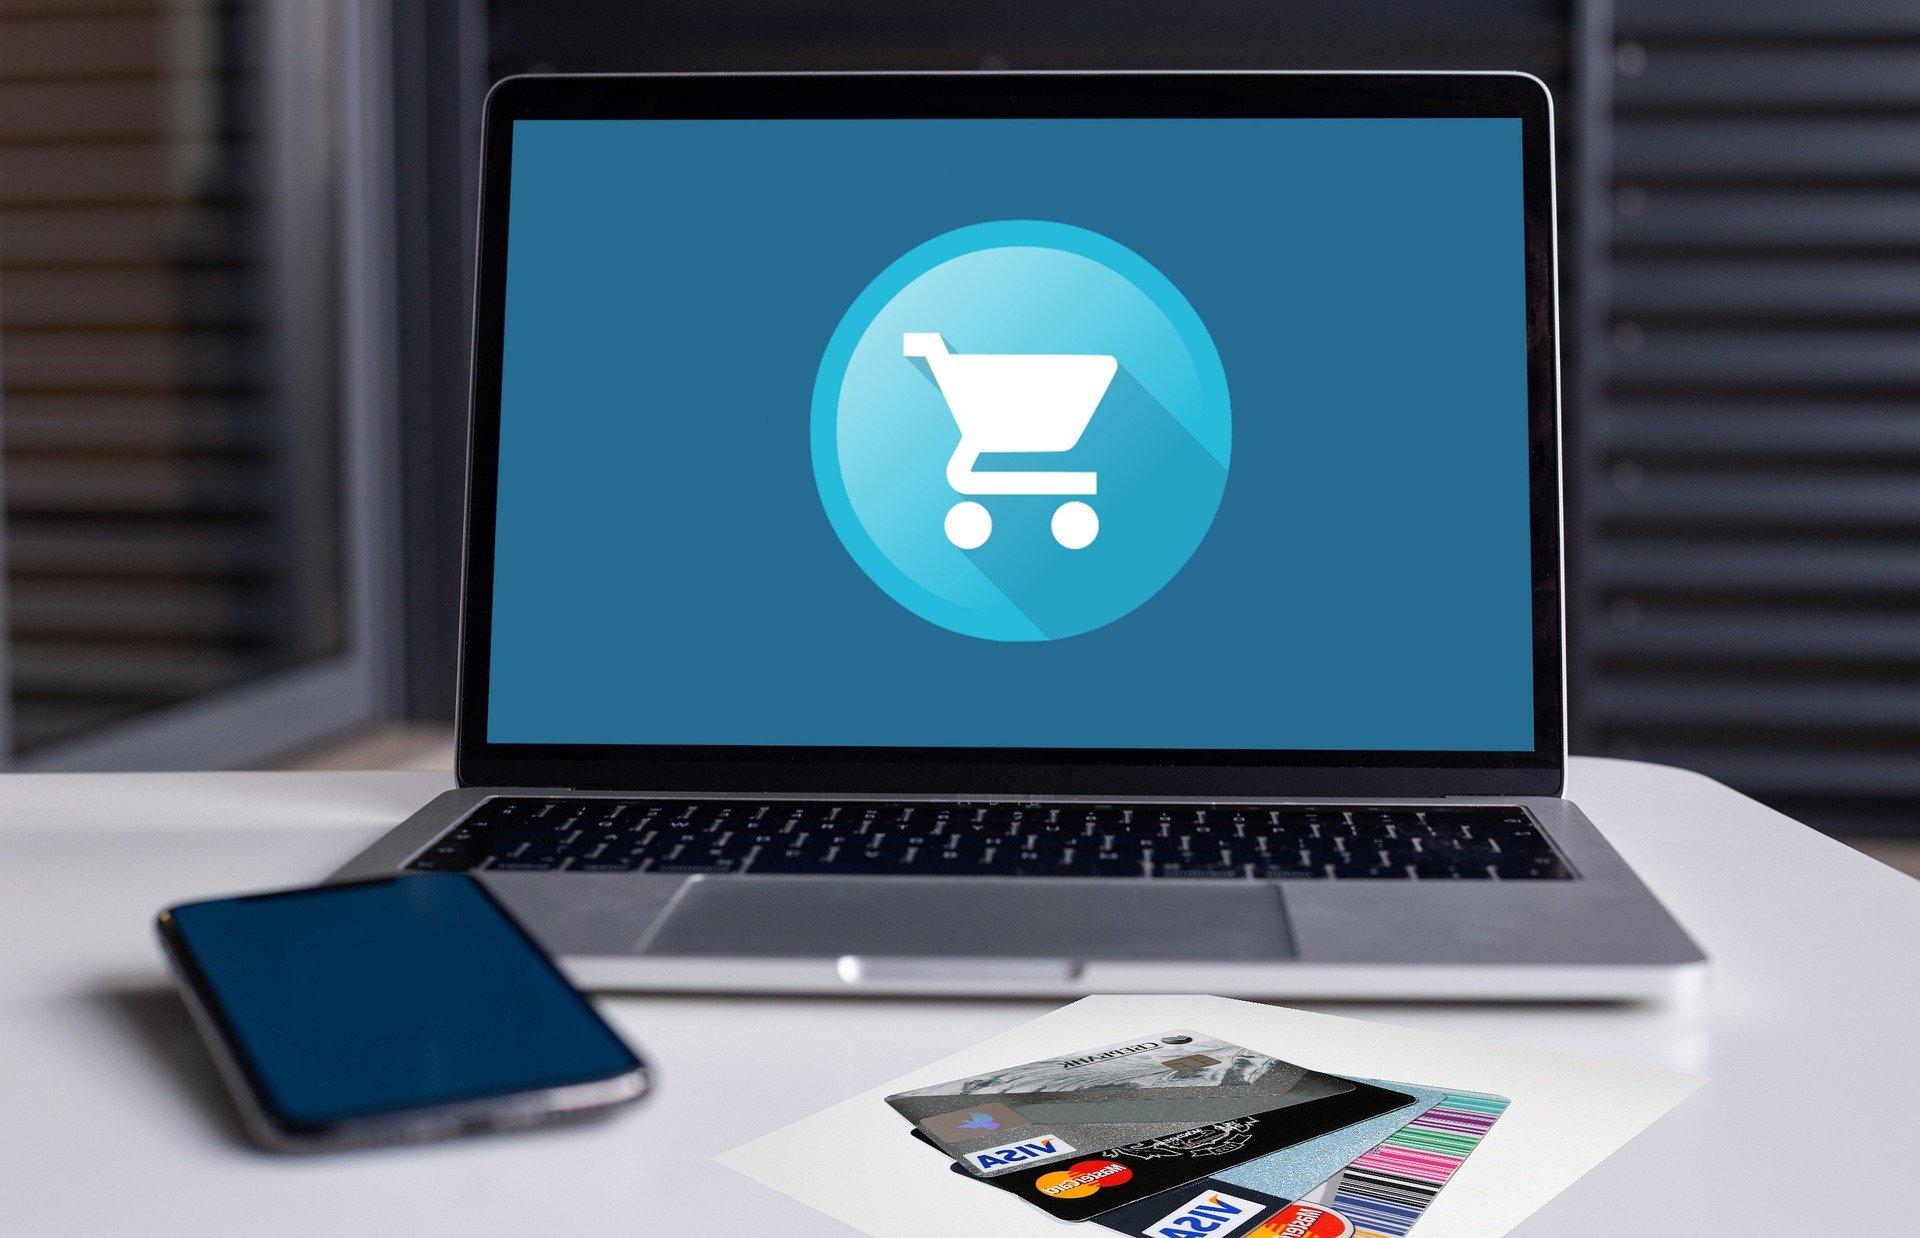 Pantalla portátil compra online